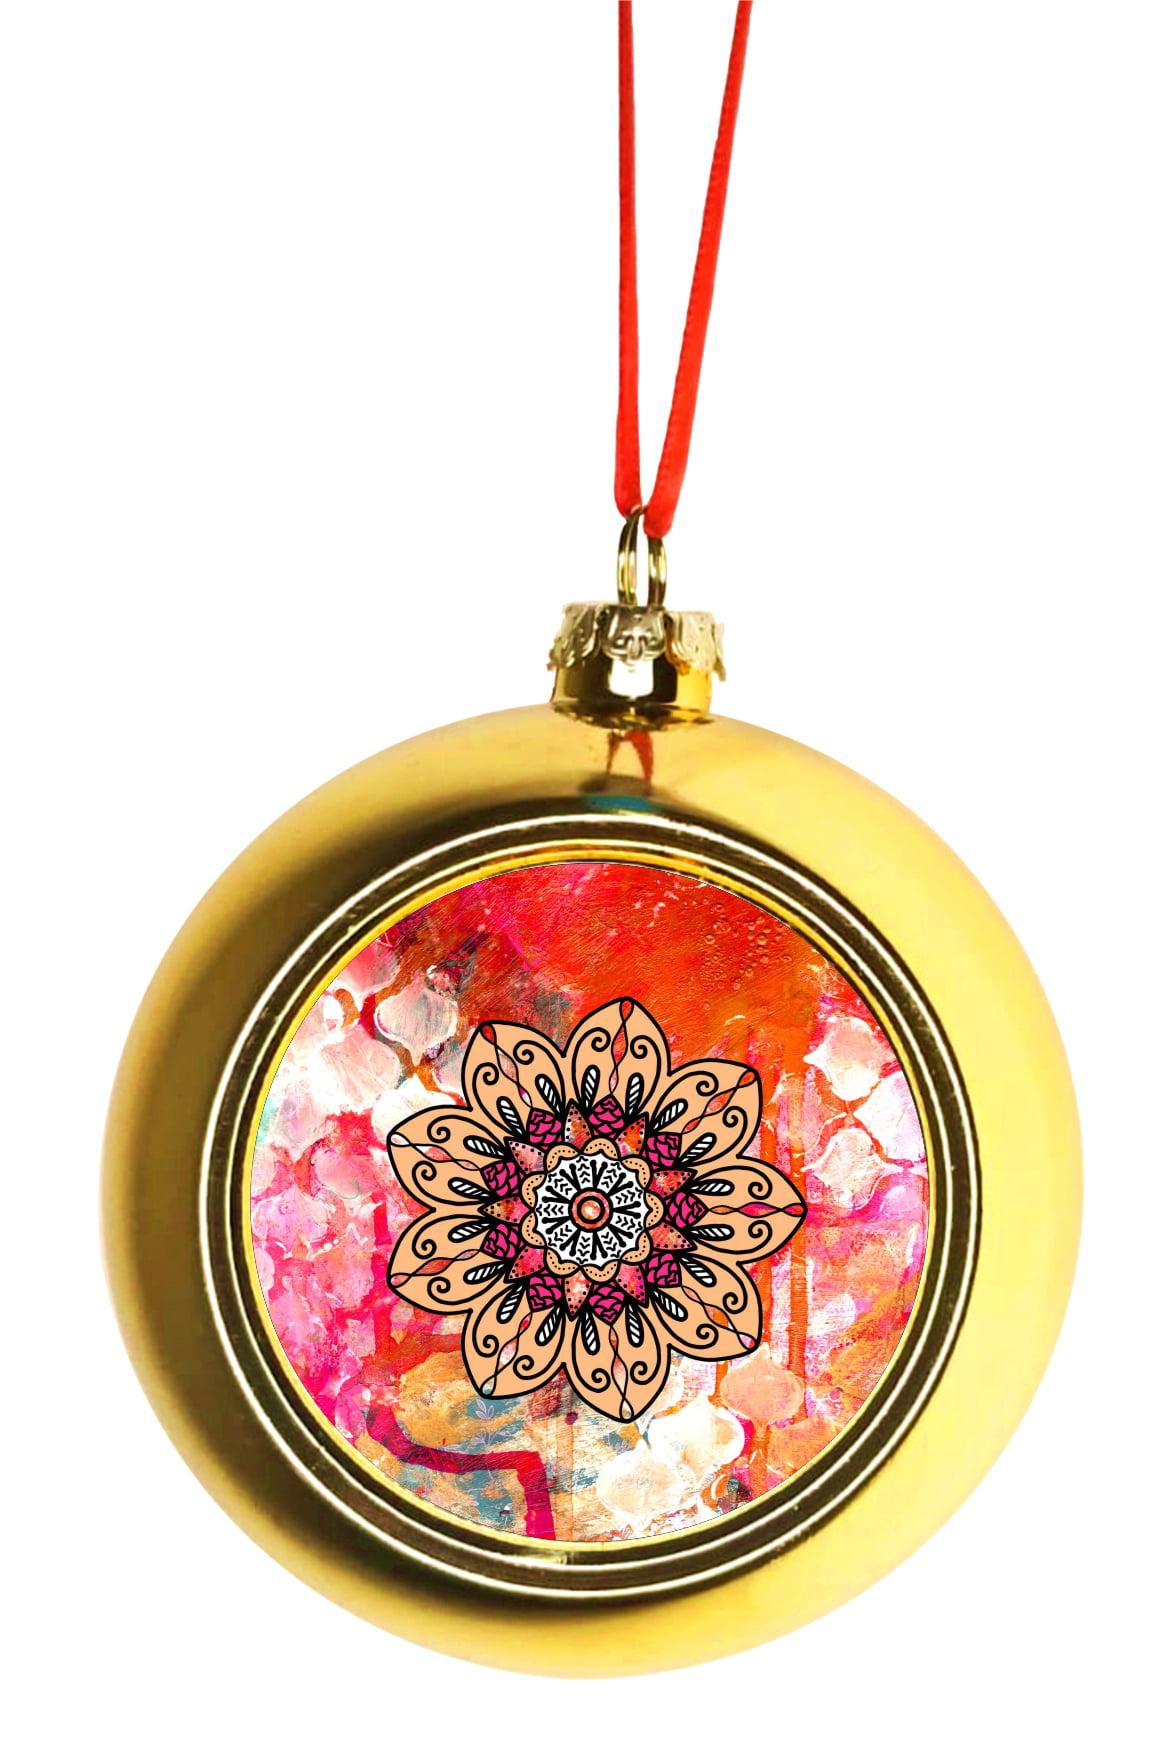 Watercolor Floral Mandala Ornaments Gold Bauble Christmas Ornament Balls